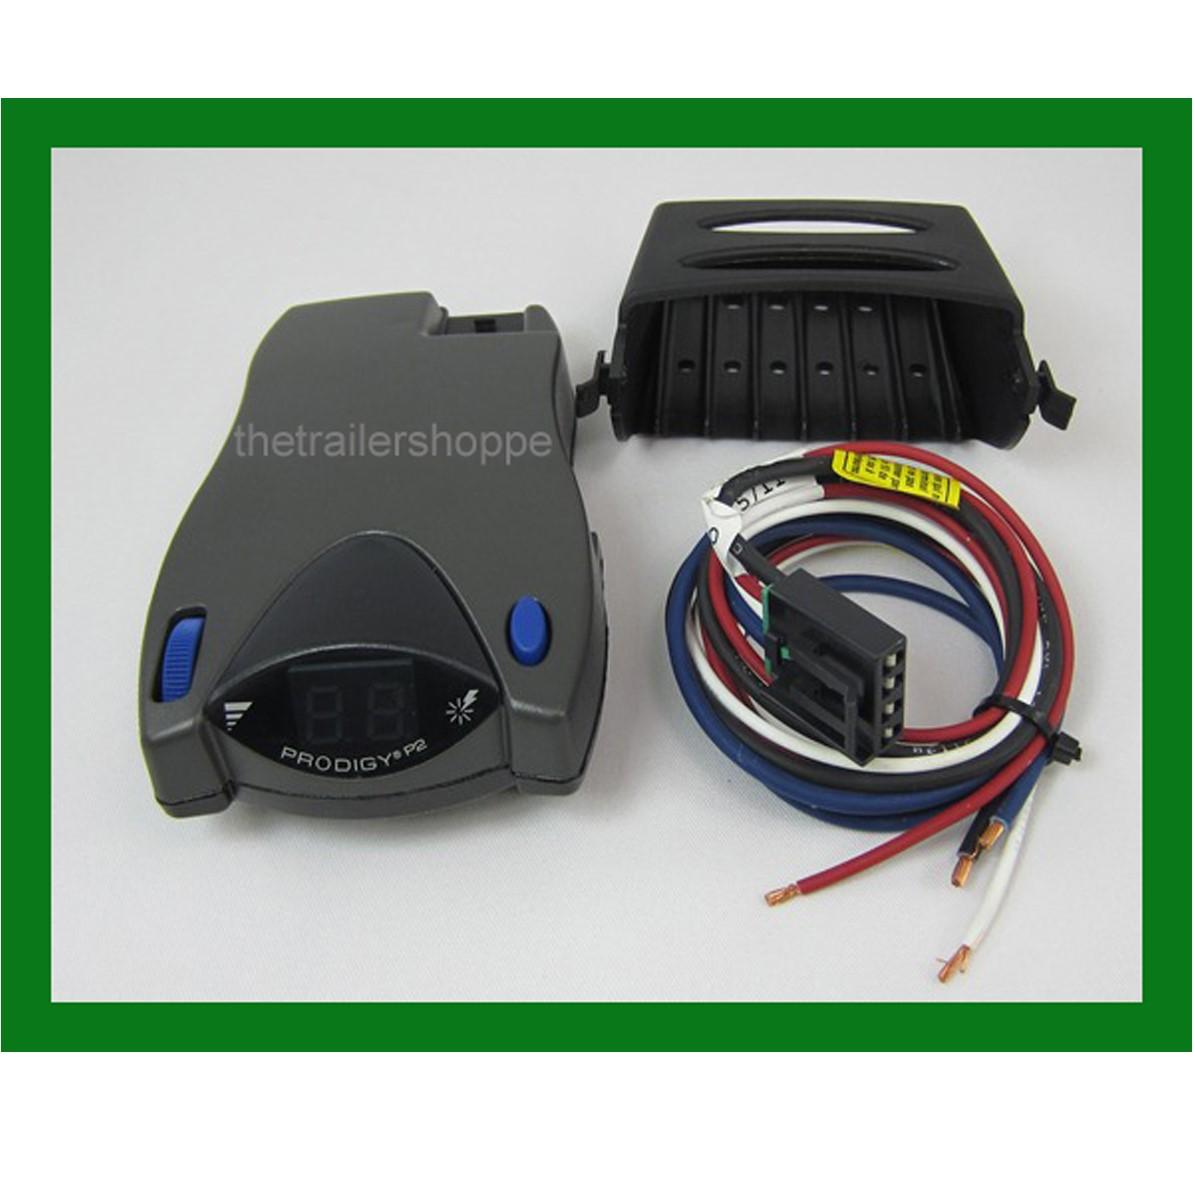 Tekonsha Prodigy P2 Electronic Brake Controller The Trailer Shoppe